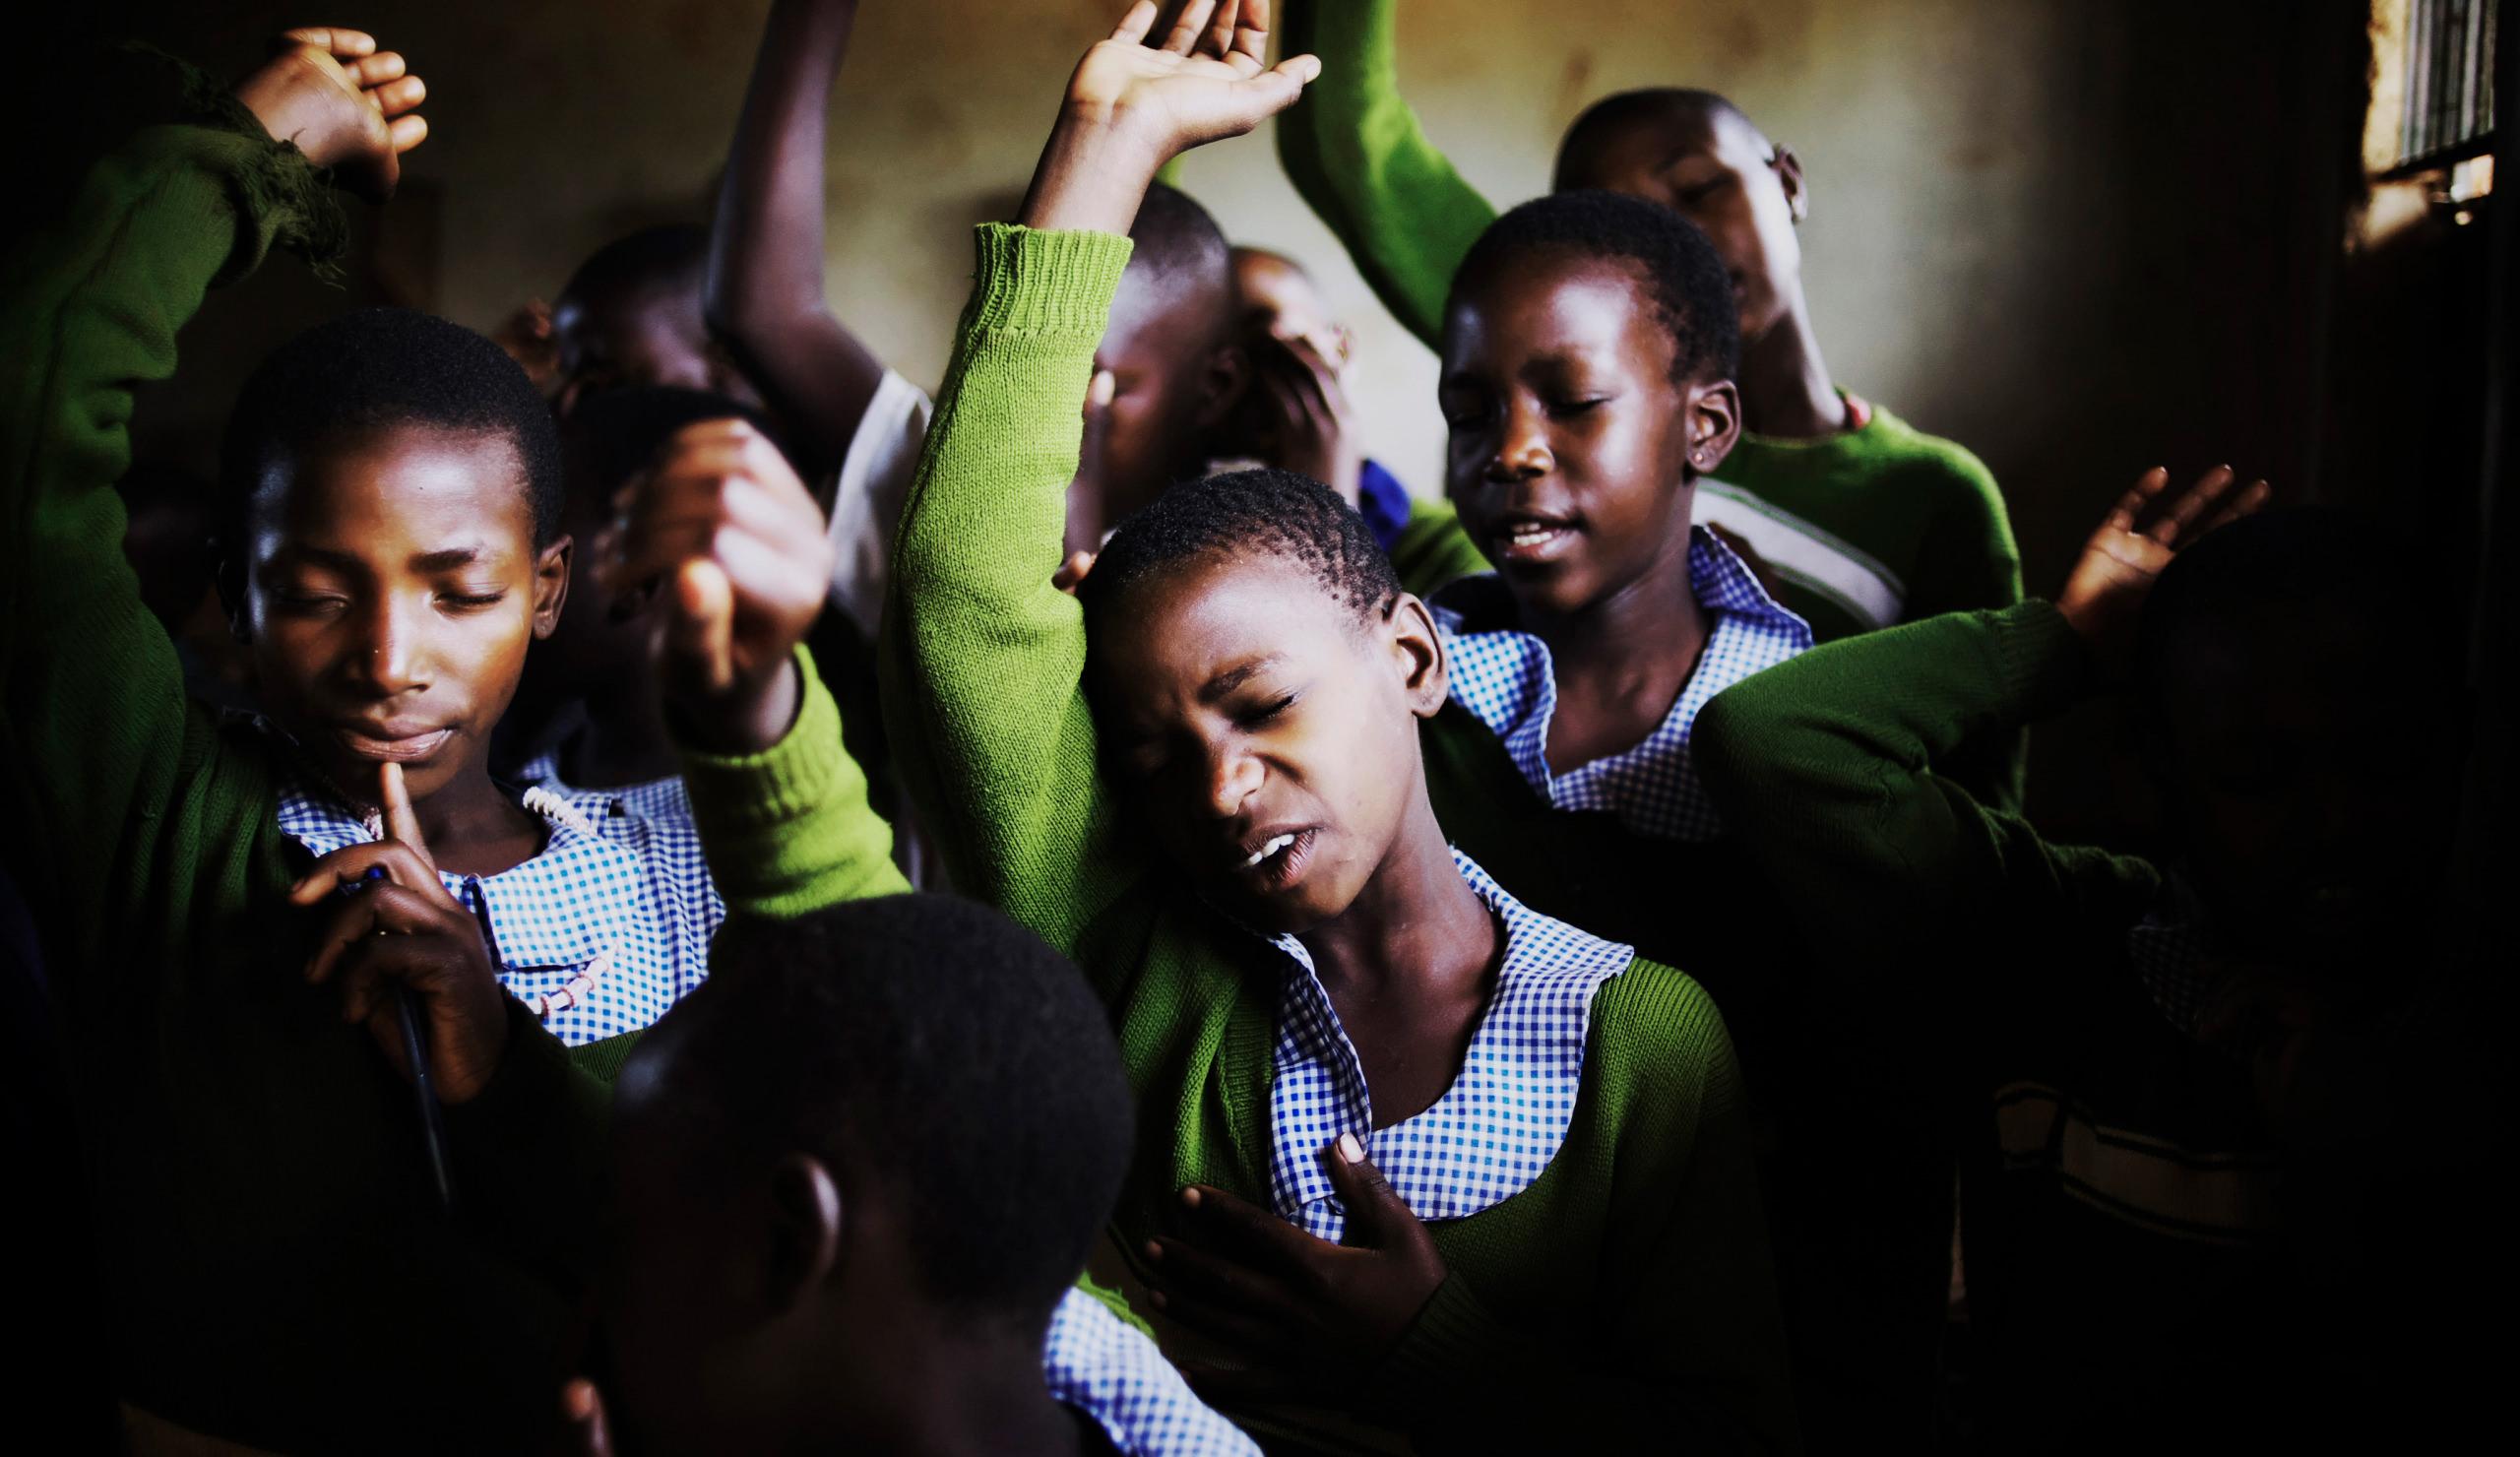 School children in rural Uganda during morning prayer